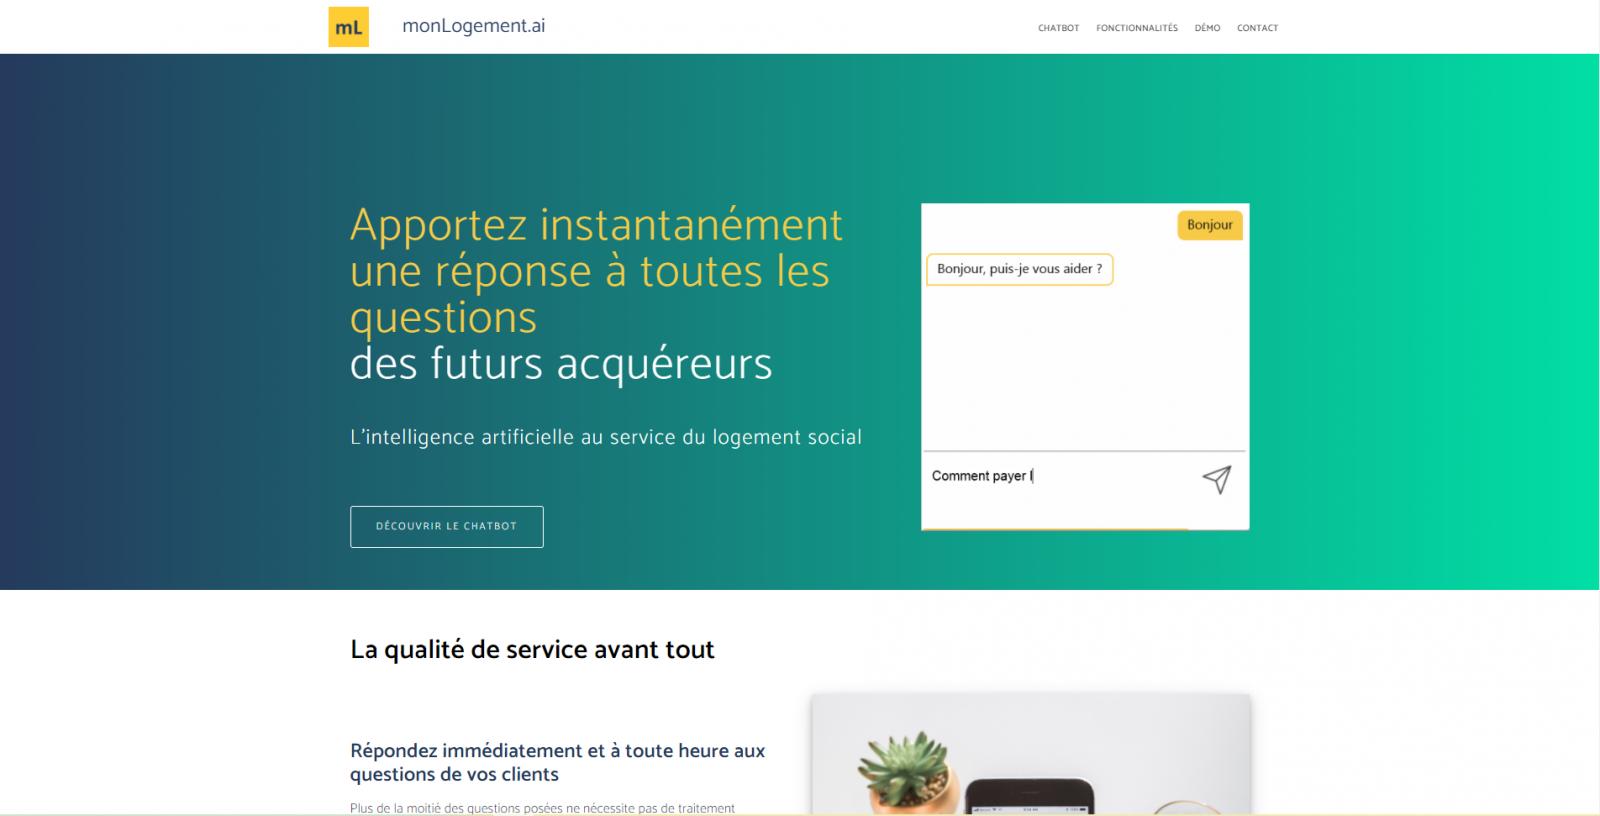 Monlogement.ai Homepage Startup Gestion Locative